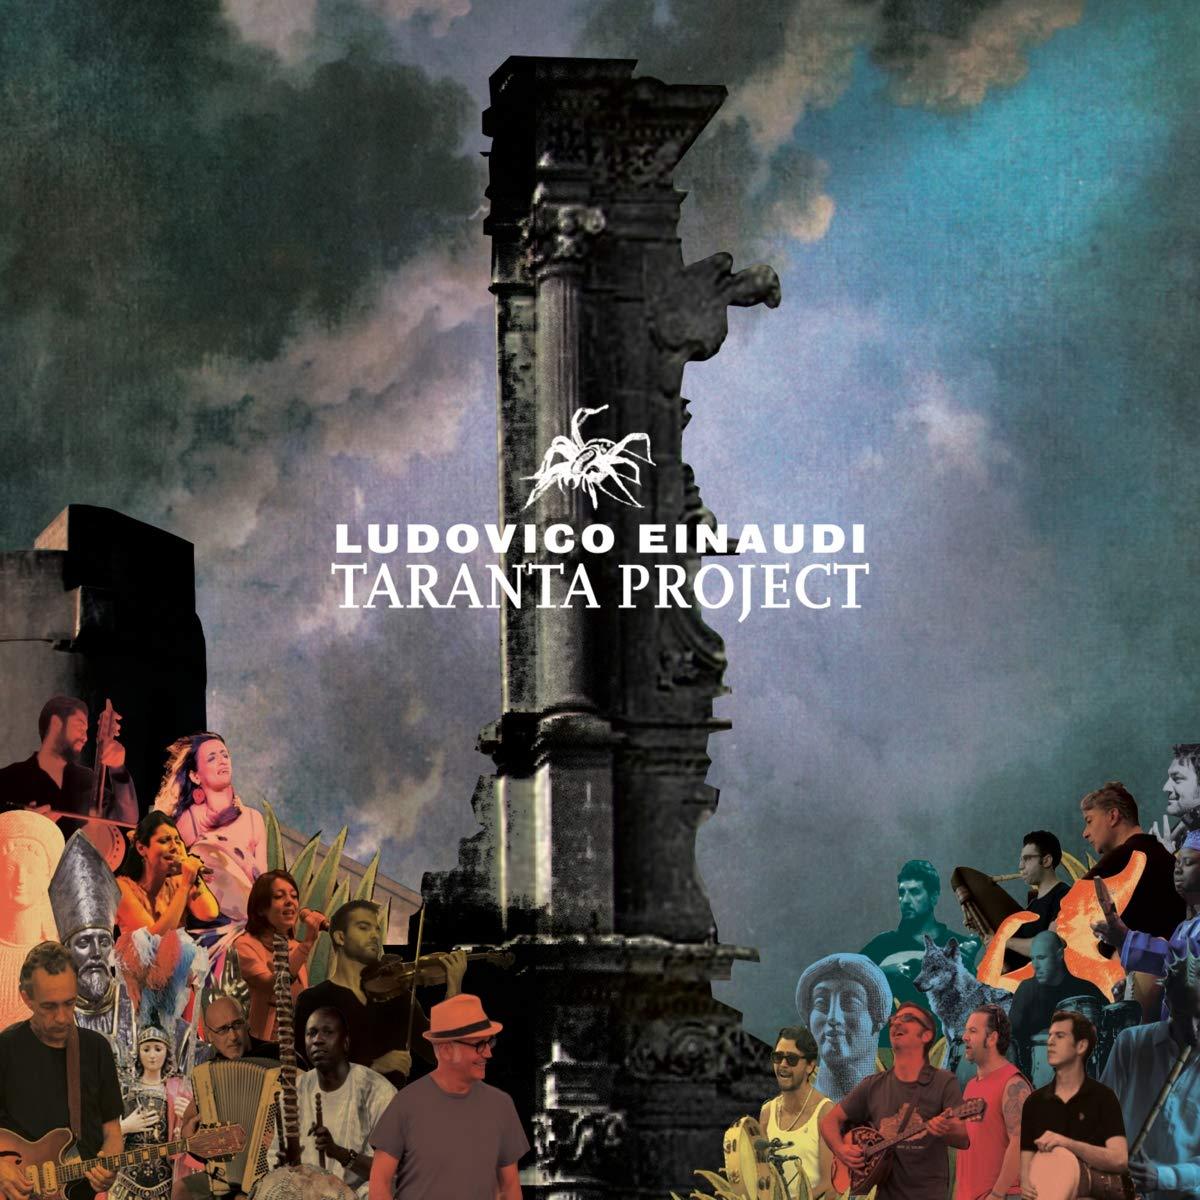 LUDOVICO EINAUDI - TARANTA PROJECT (CD)